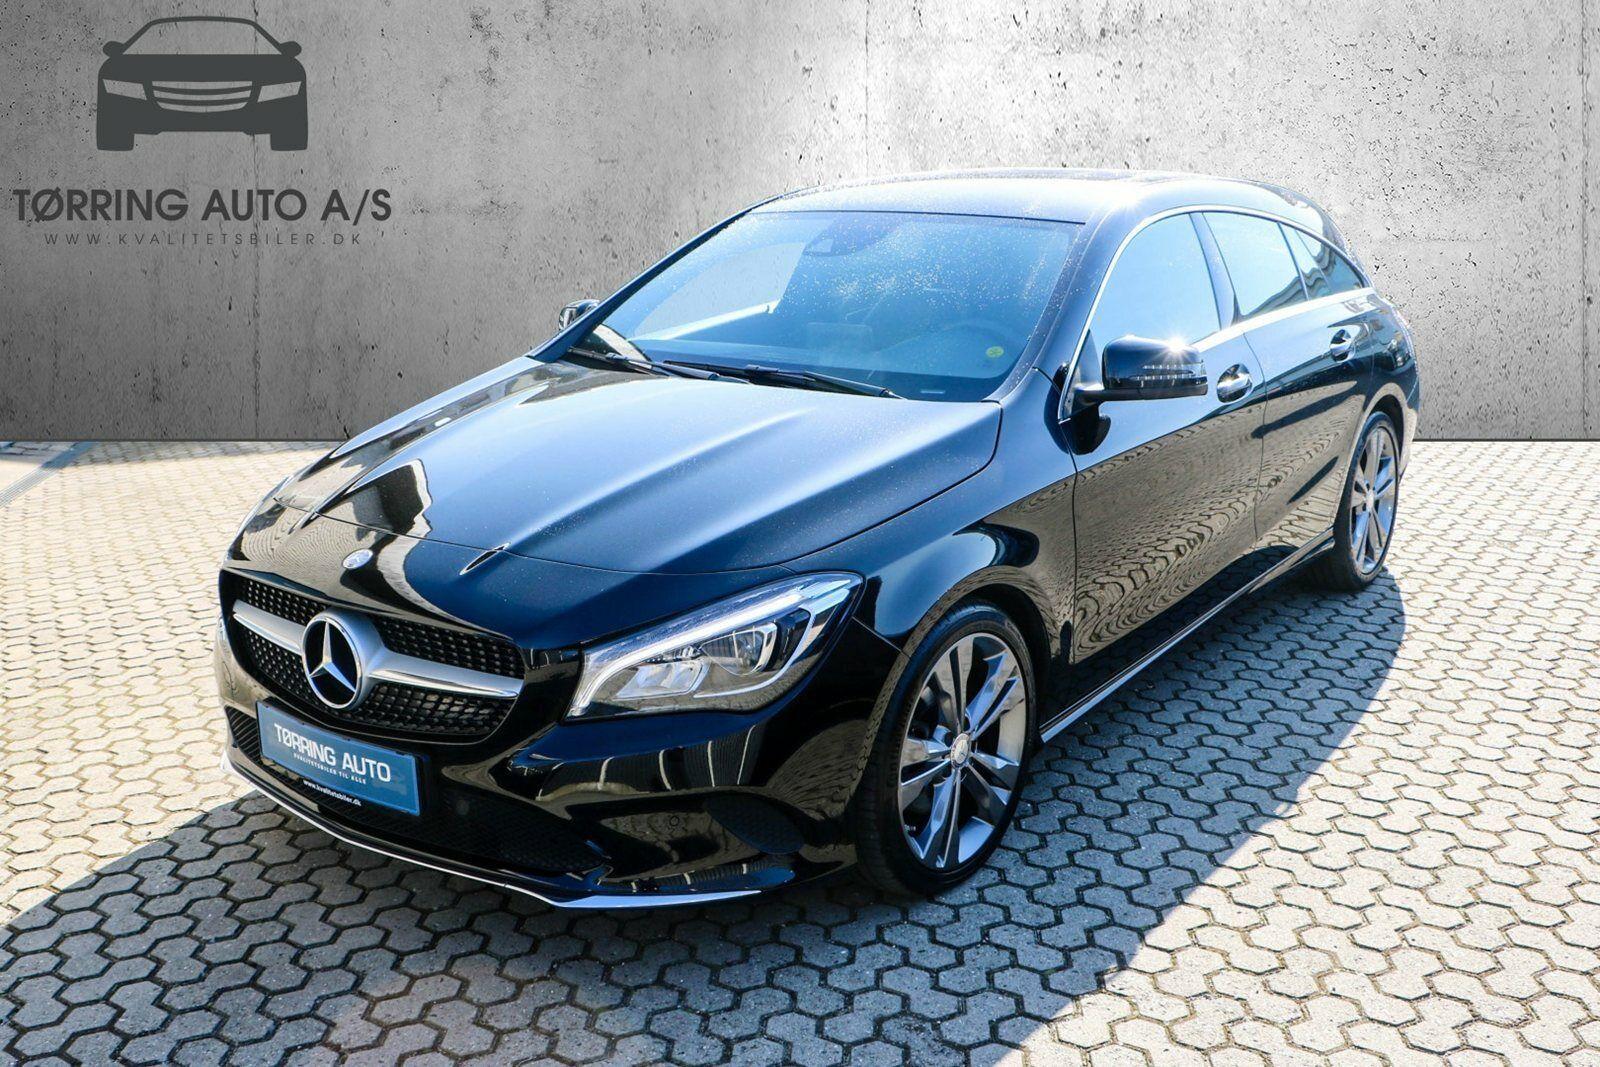 Mercedes CLA220 d 2,2 SB aut. 5d - 367.900 kr.